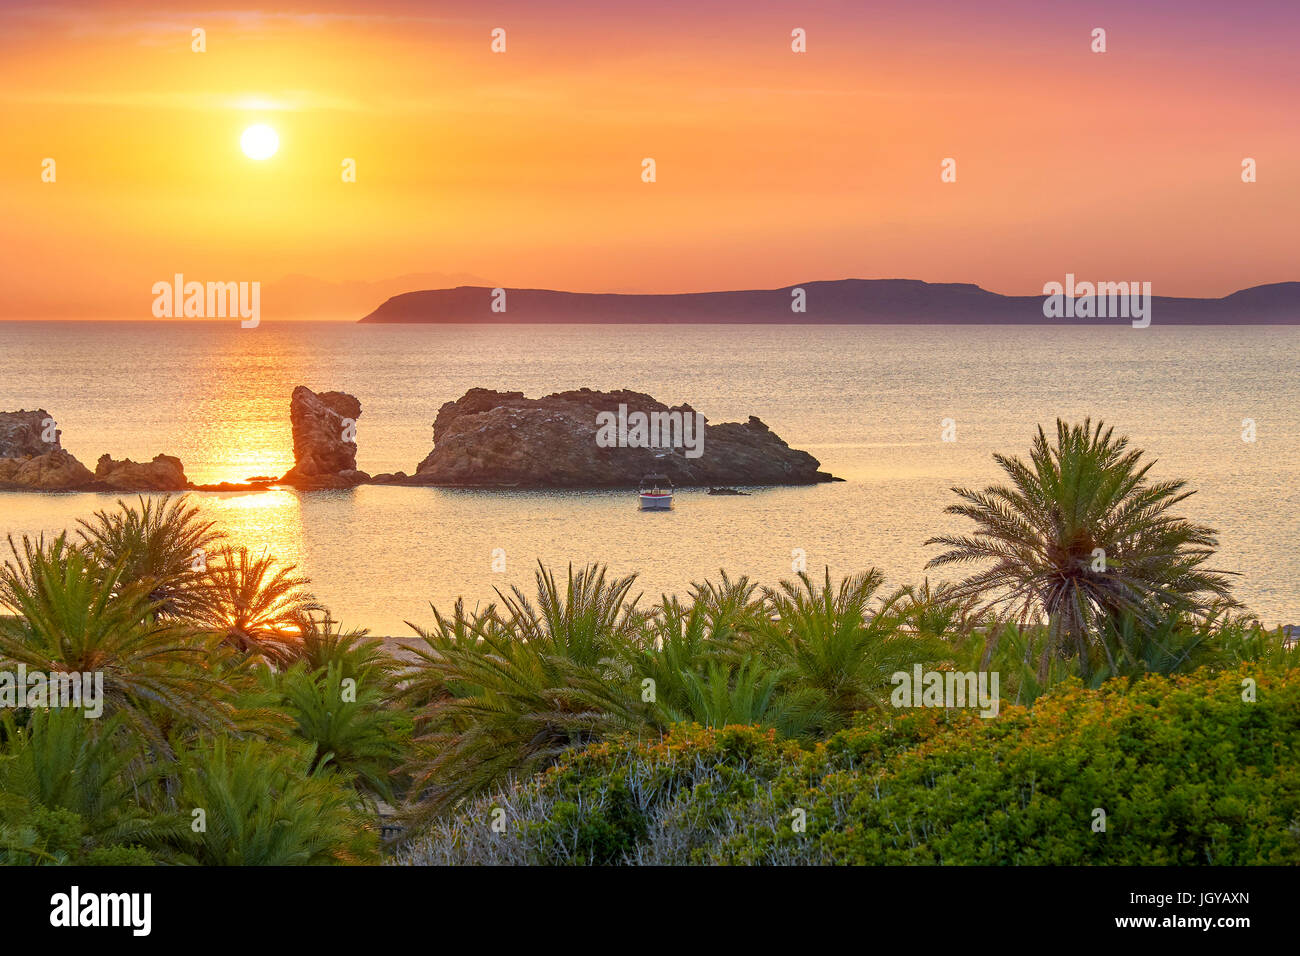 Vai Beach at sunrise, Crete Island, Greece - Stock Image